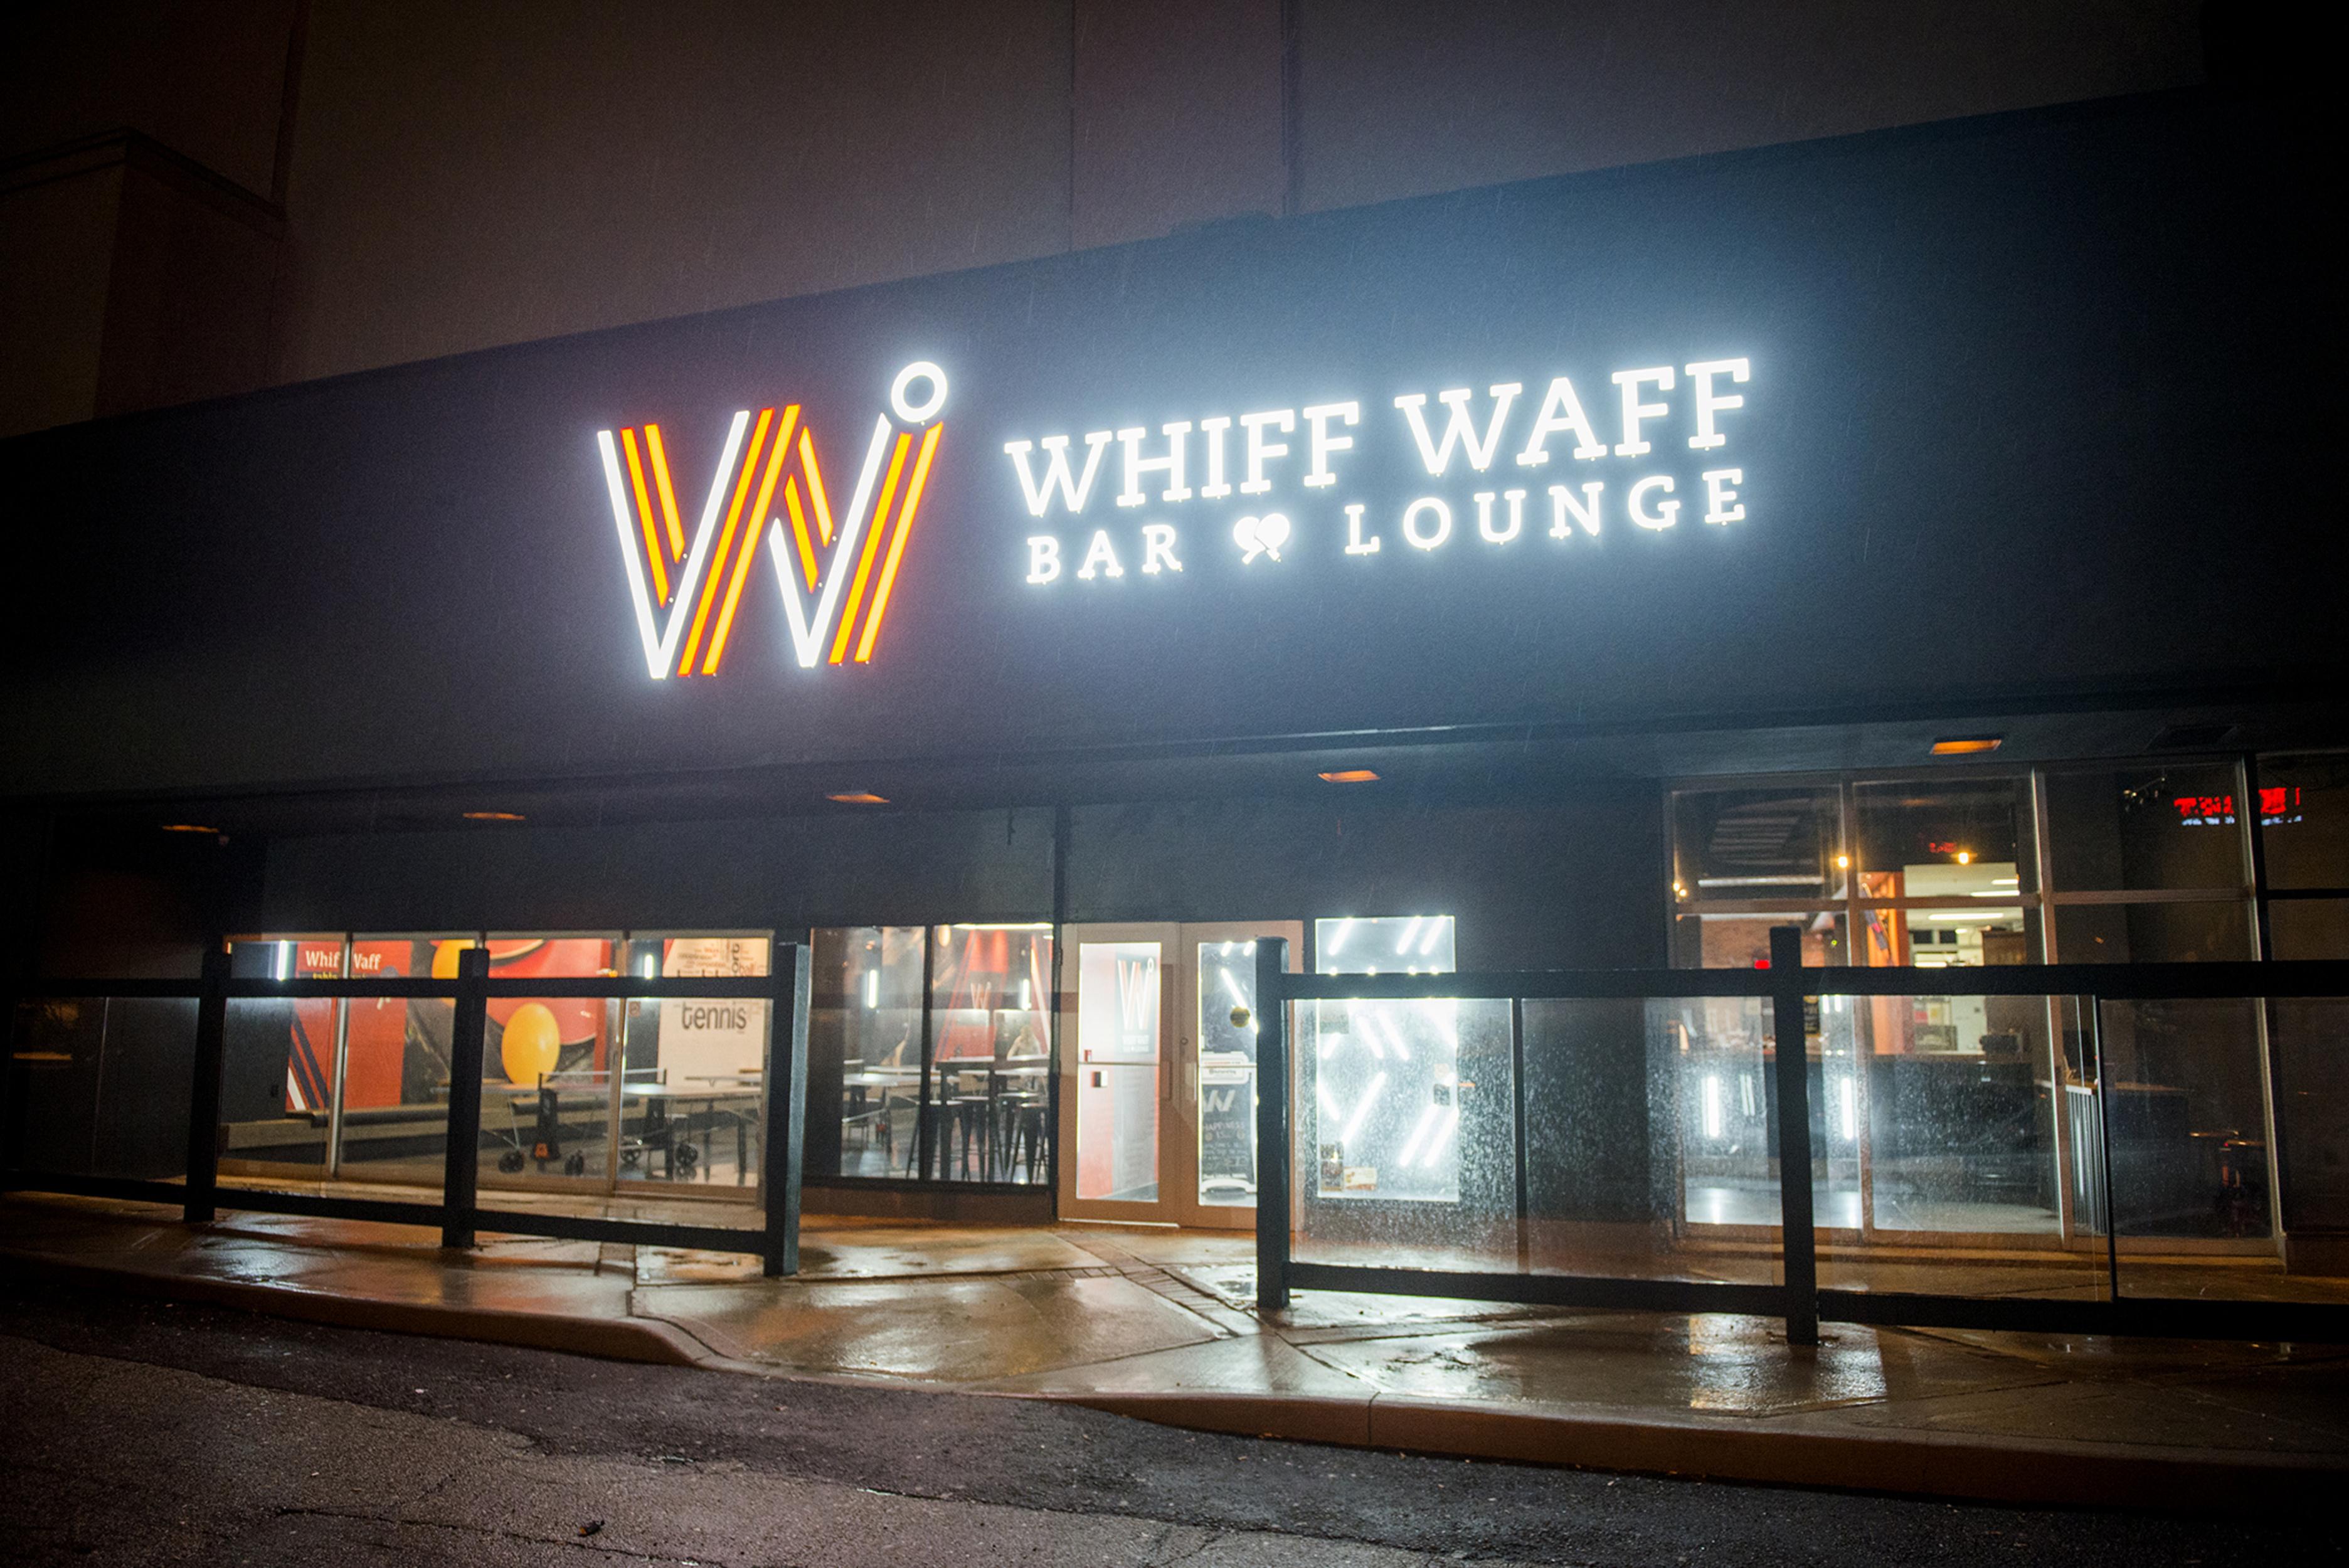 whiff waff